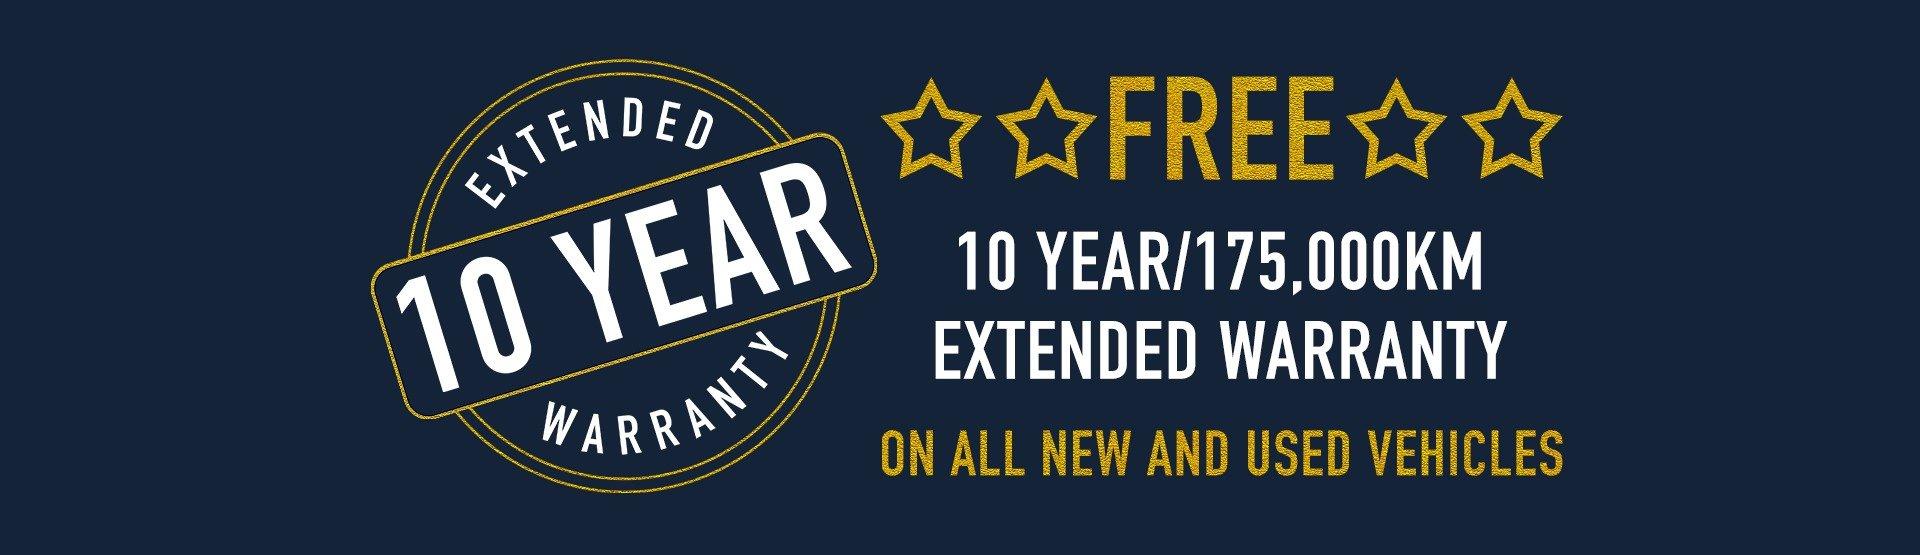 Free 10 year/175,000km extended warranty